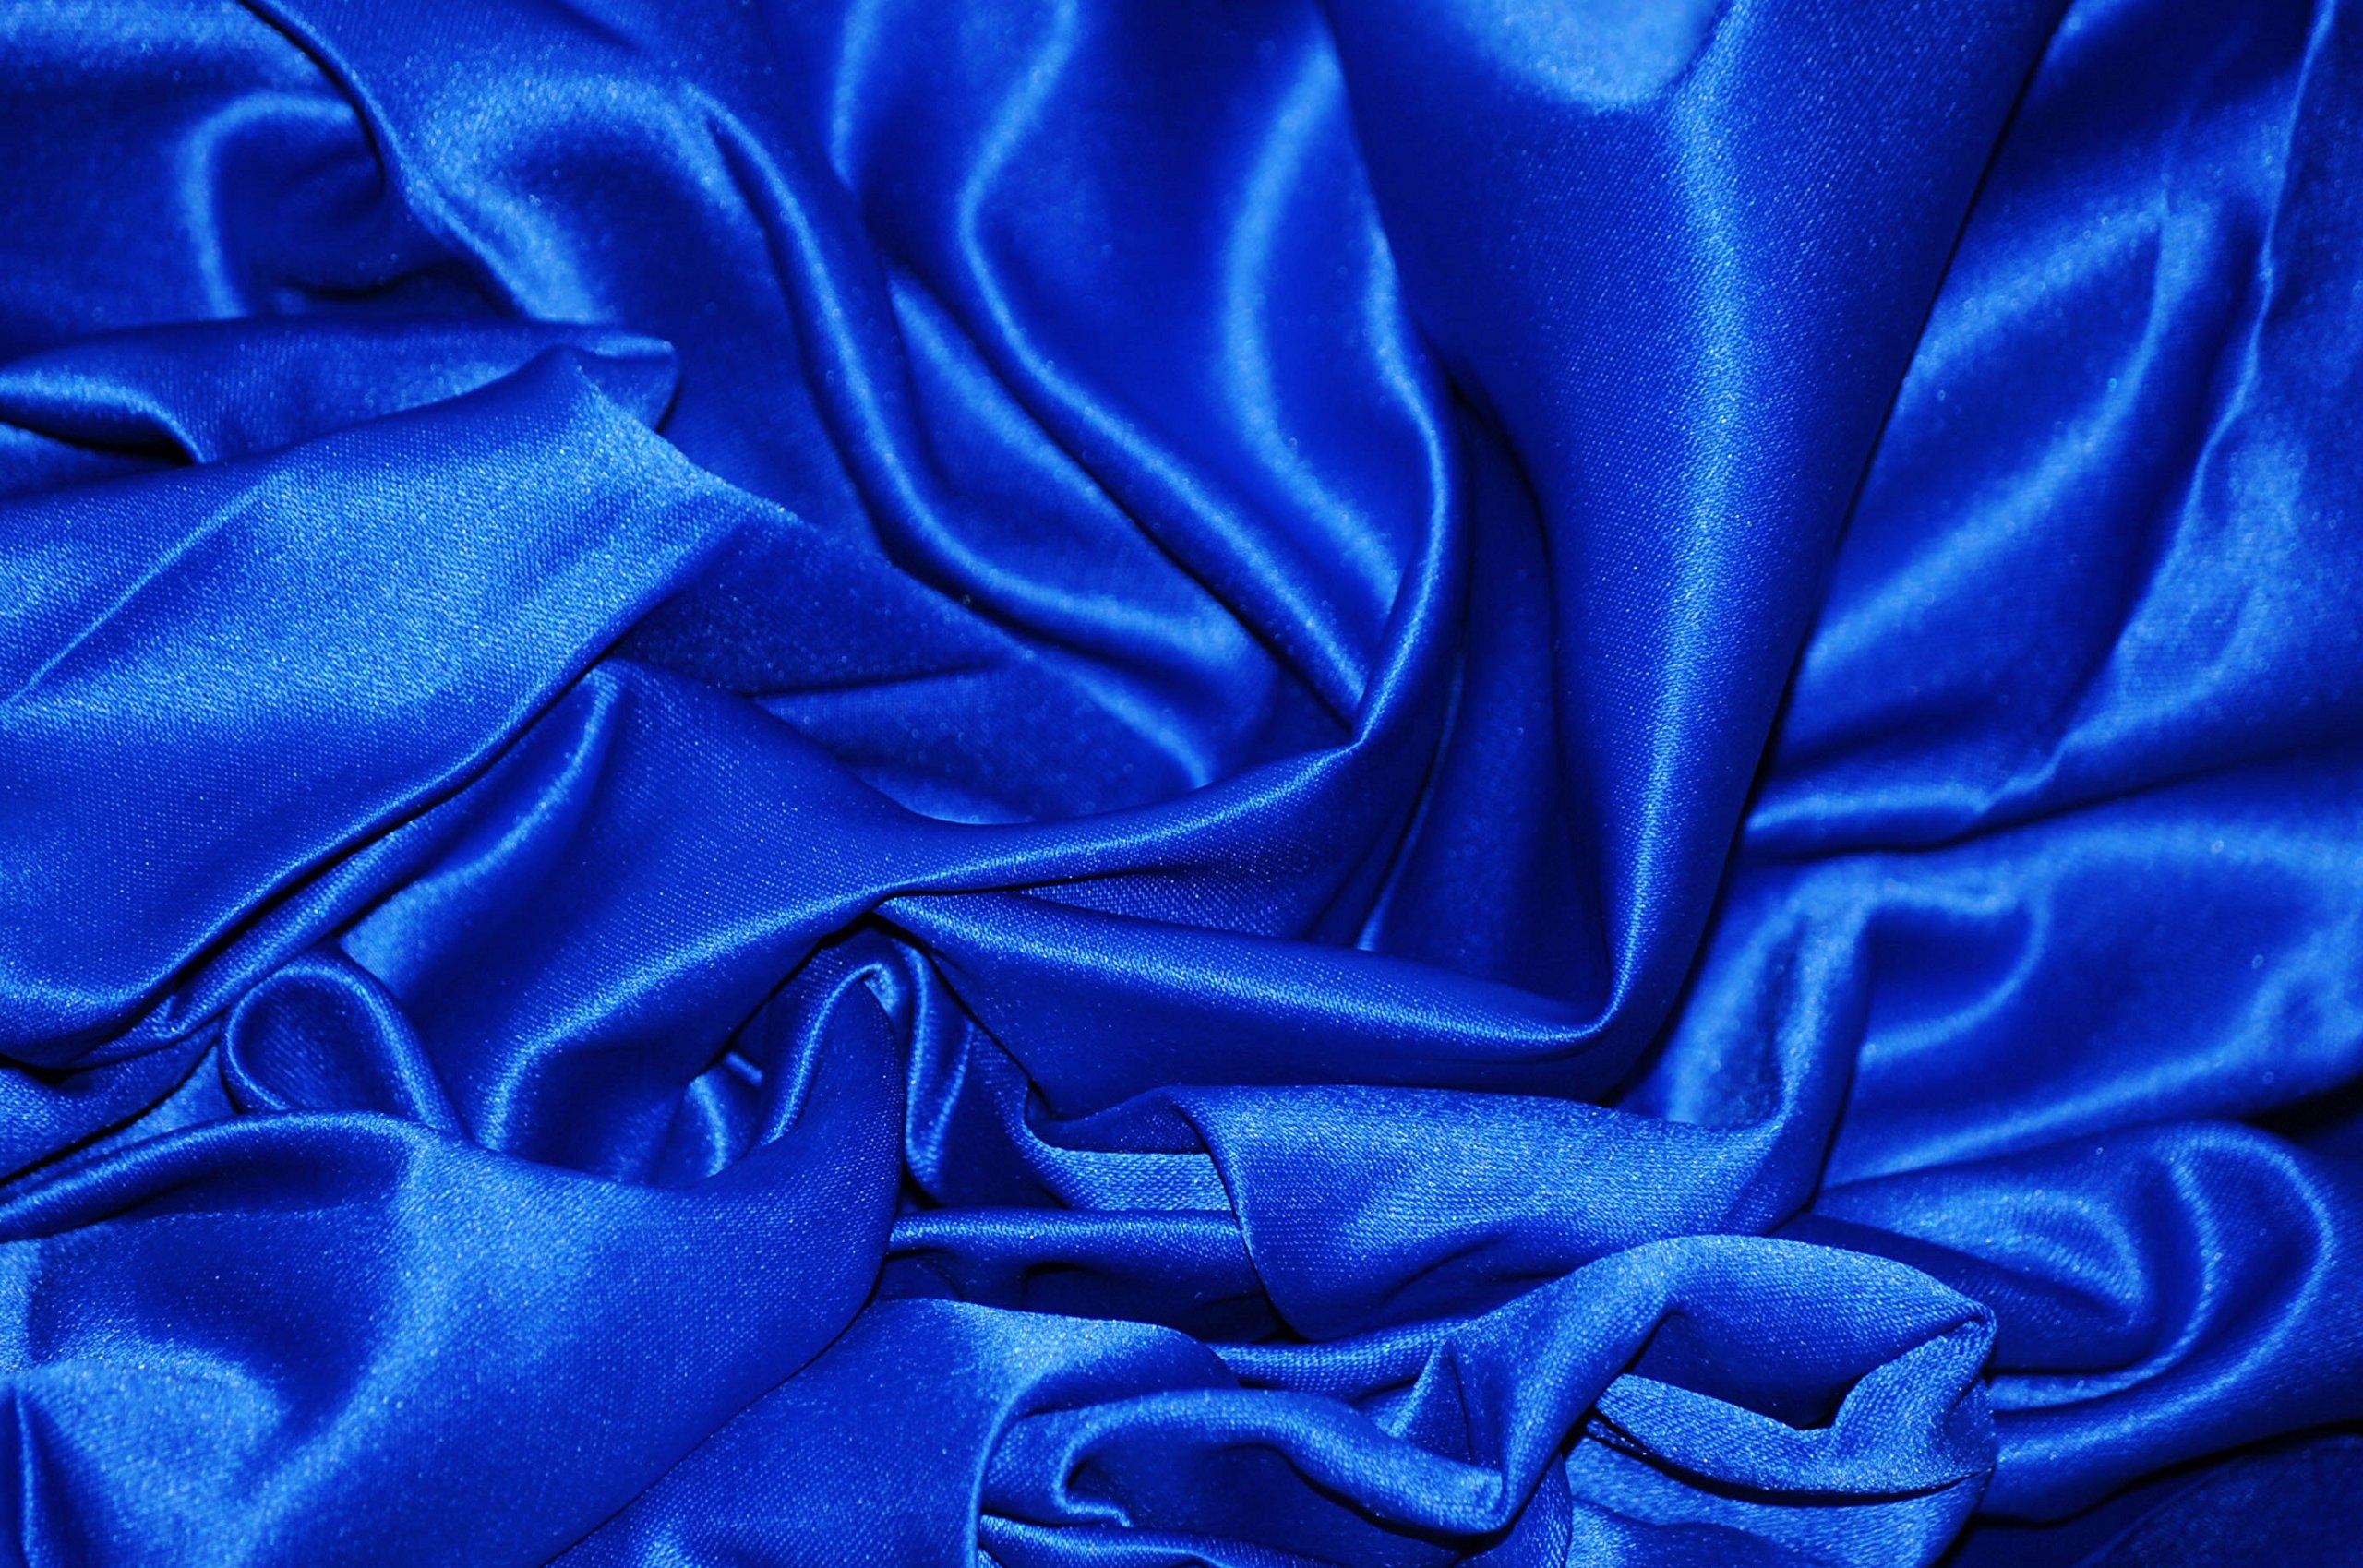 Ex-Lg Blue Floral Satin Bonnet/Satin Sleep Cap/Braid Cap/Dreadlock Cap